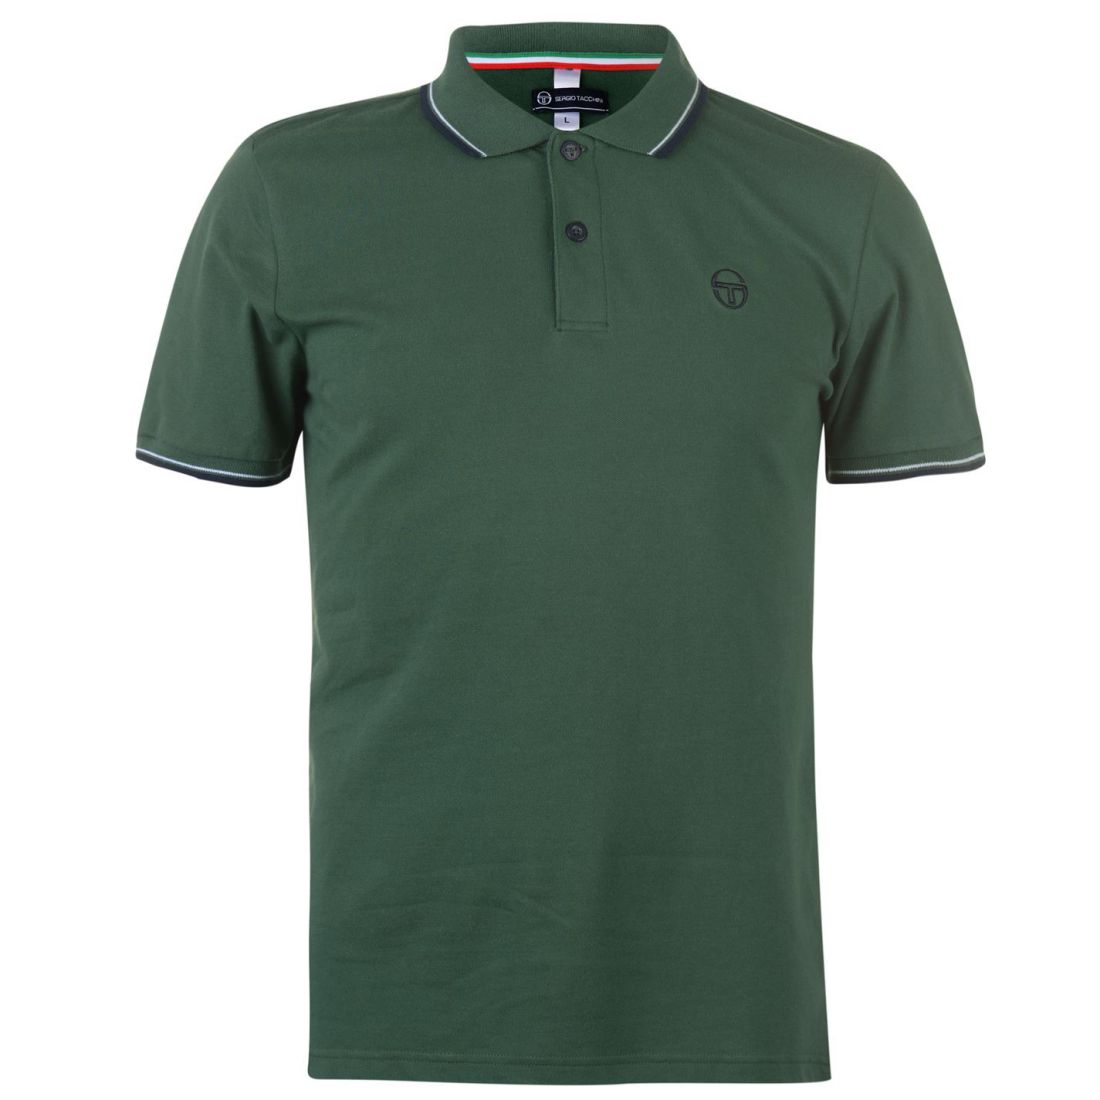 5fc18cb86 Sergio Tacchini Zuck Polo Shirt Mens Gents Classic Fit Tee Top Short ...